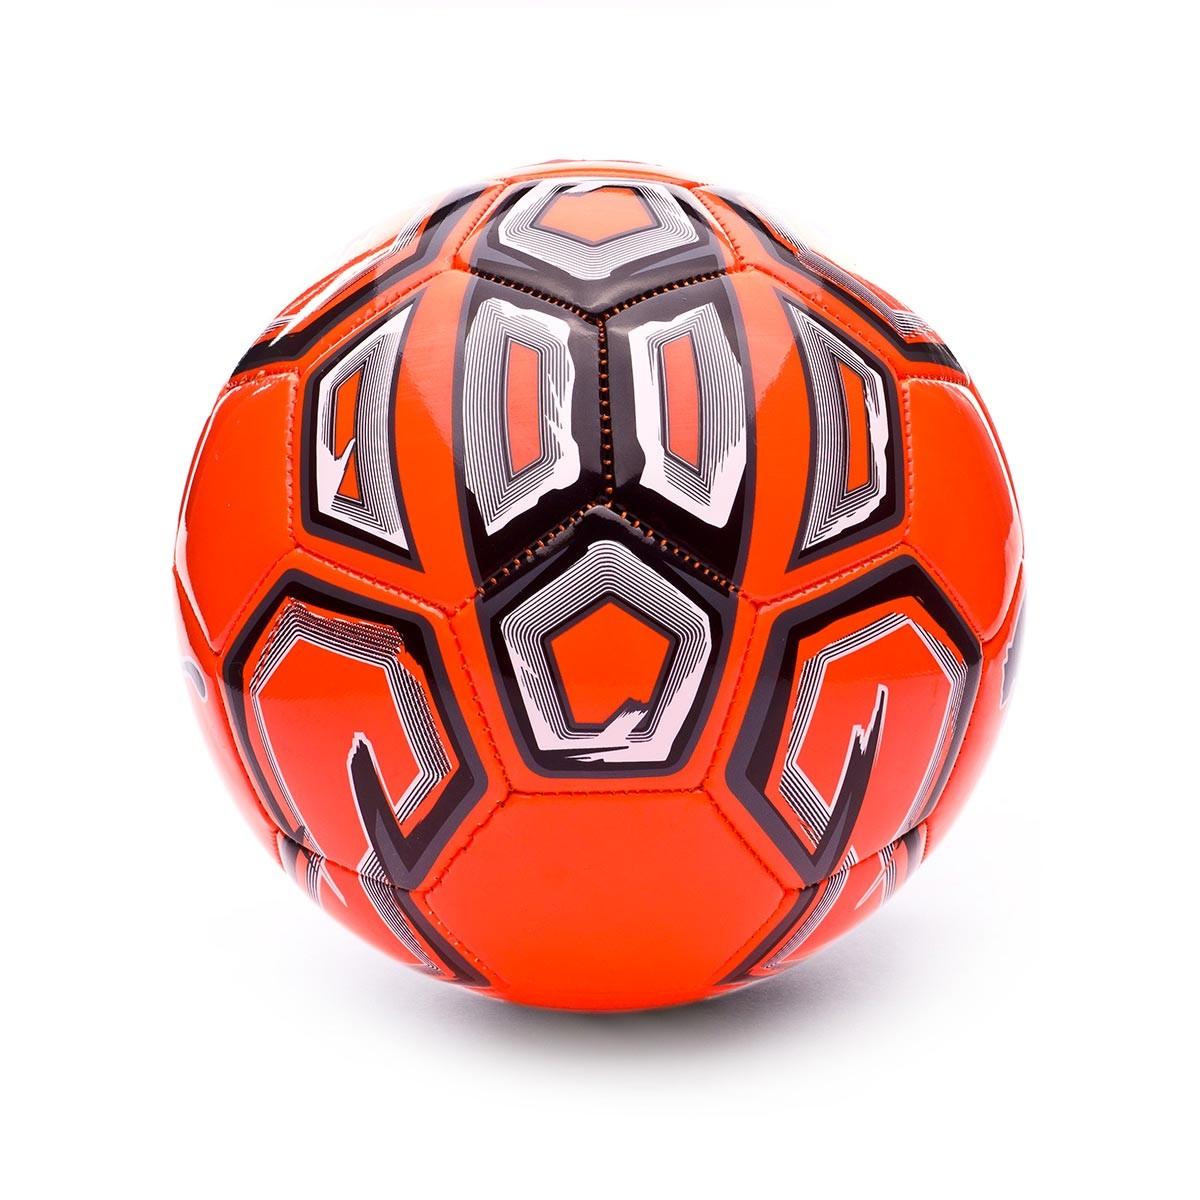 ... Balón Futsal 1 Trainer MS Shocking orange-Puma black-Puma white.  CATEGORIA 7c24af653492e